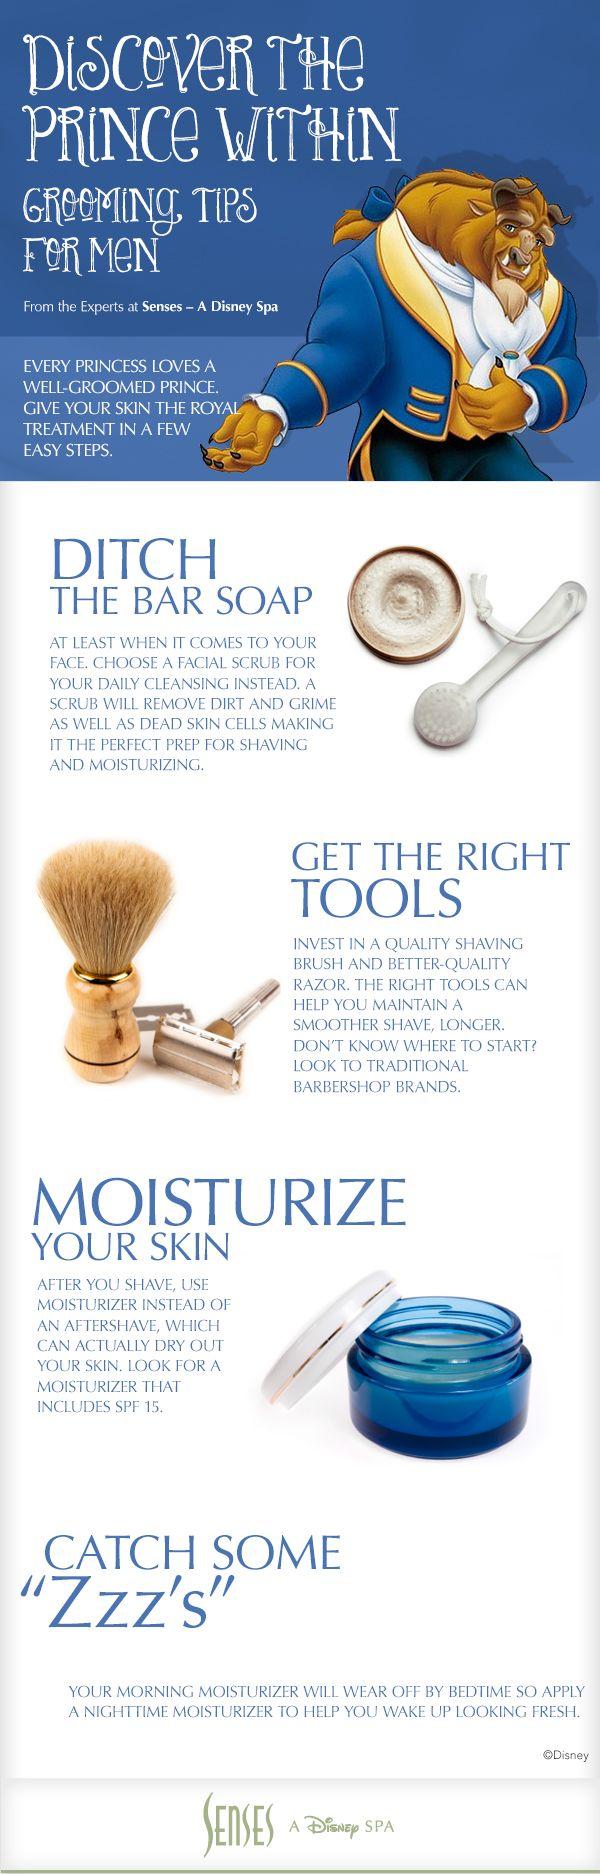 Grooming Tips for Men #WaltDisneyWorld #Spa